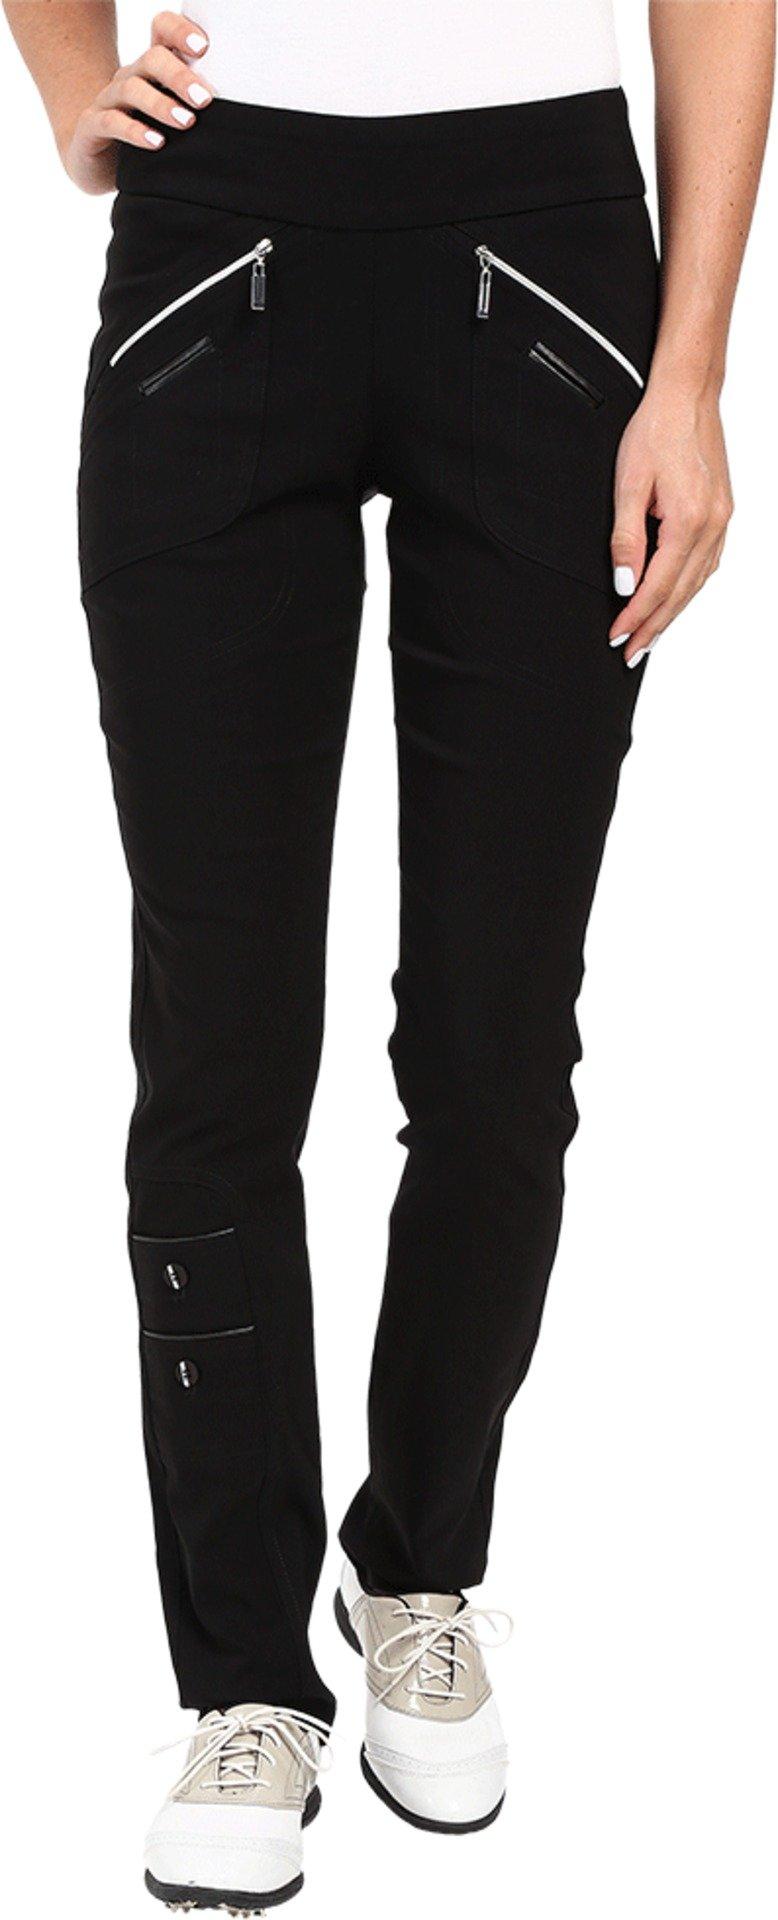 Jamie Sadock Women's Skinnylicious 41.5 in. Pant with Control Top Mesh Panel Jet Black Pants 18 X 32